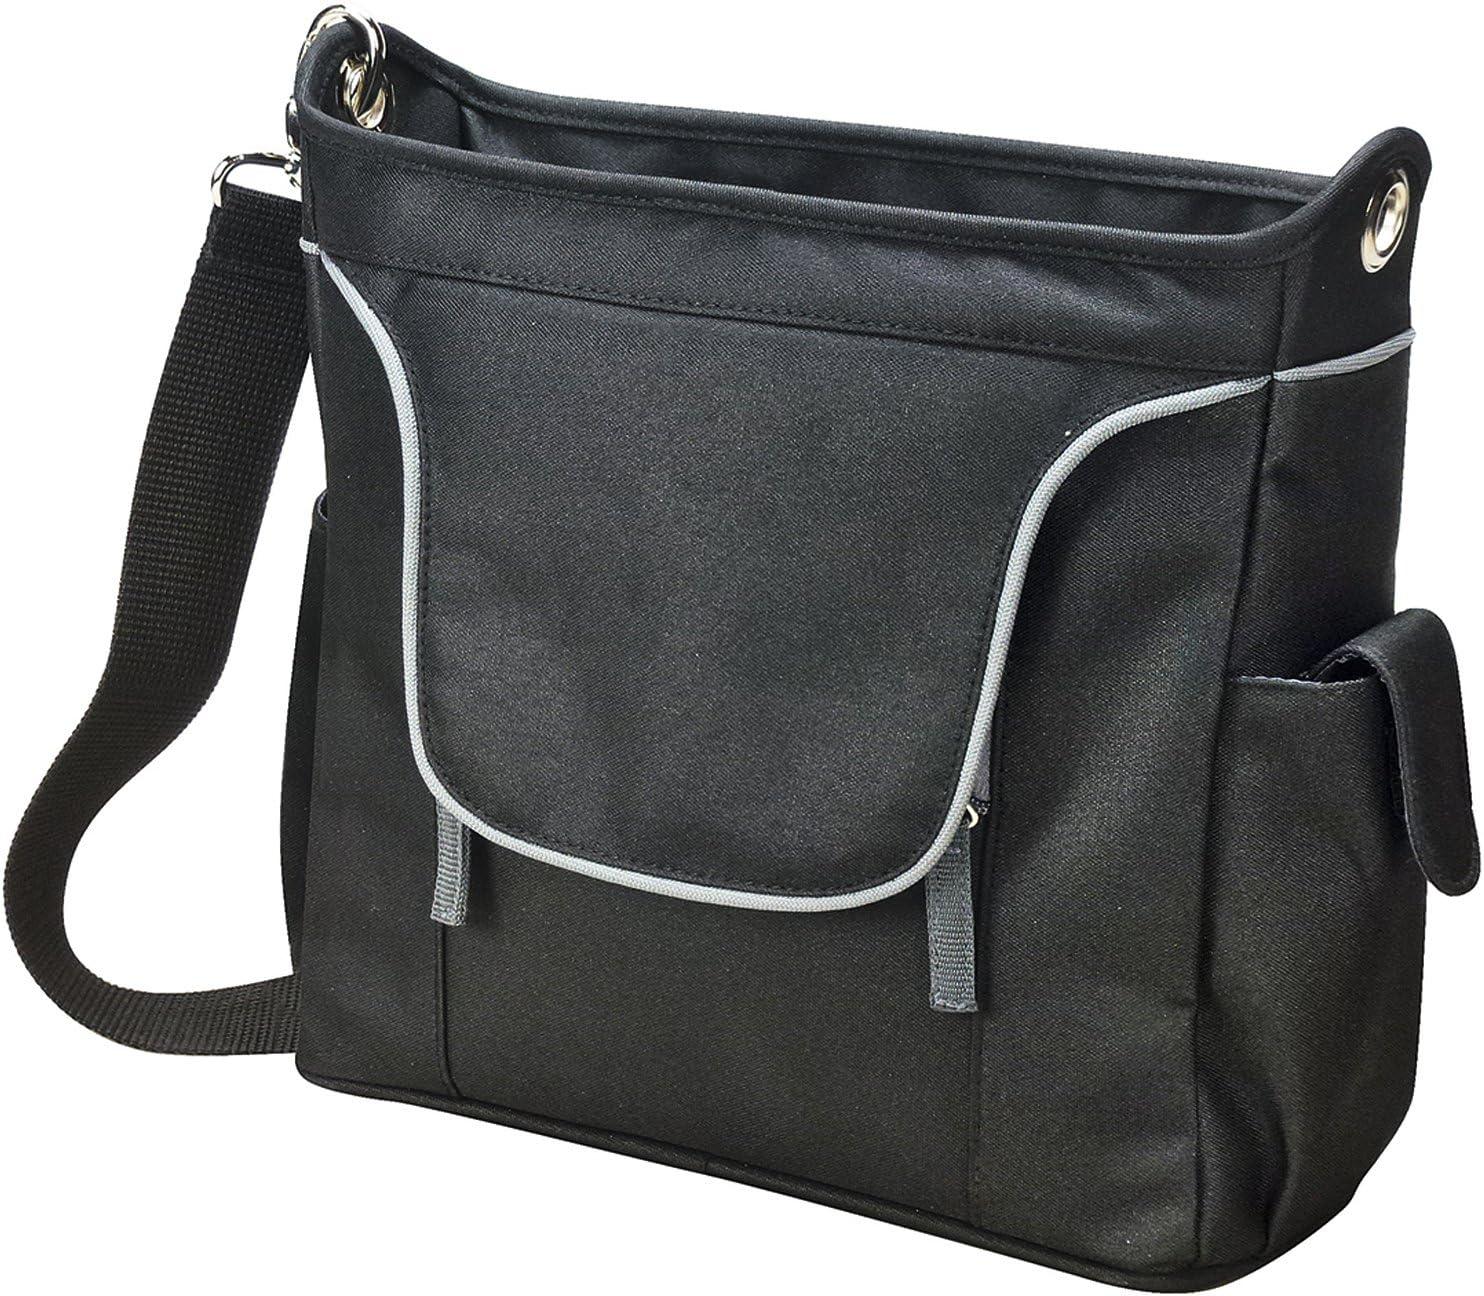 Rixen Kaul Allegra Ladies Bag